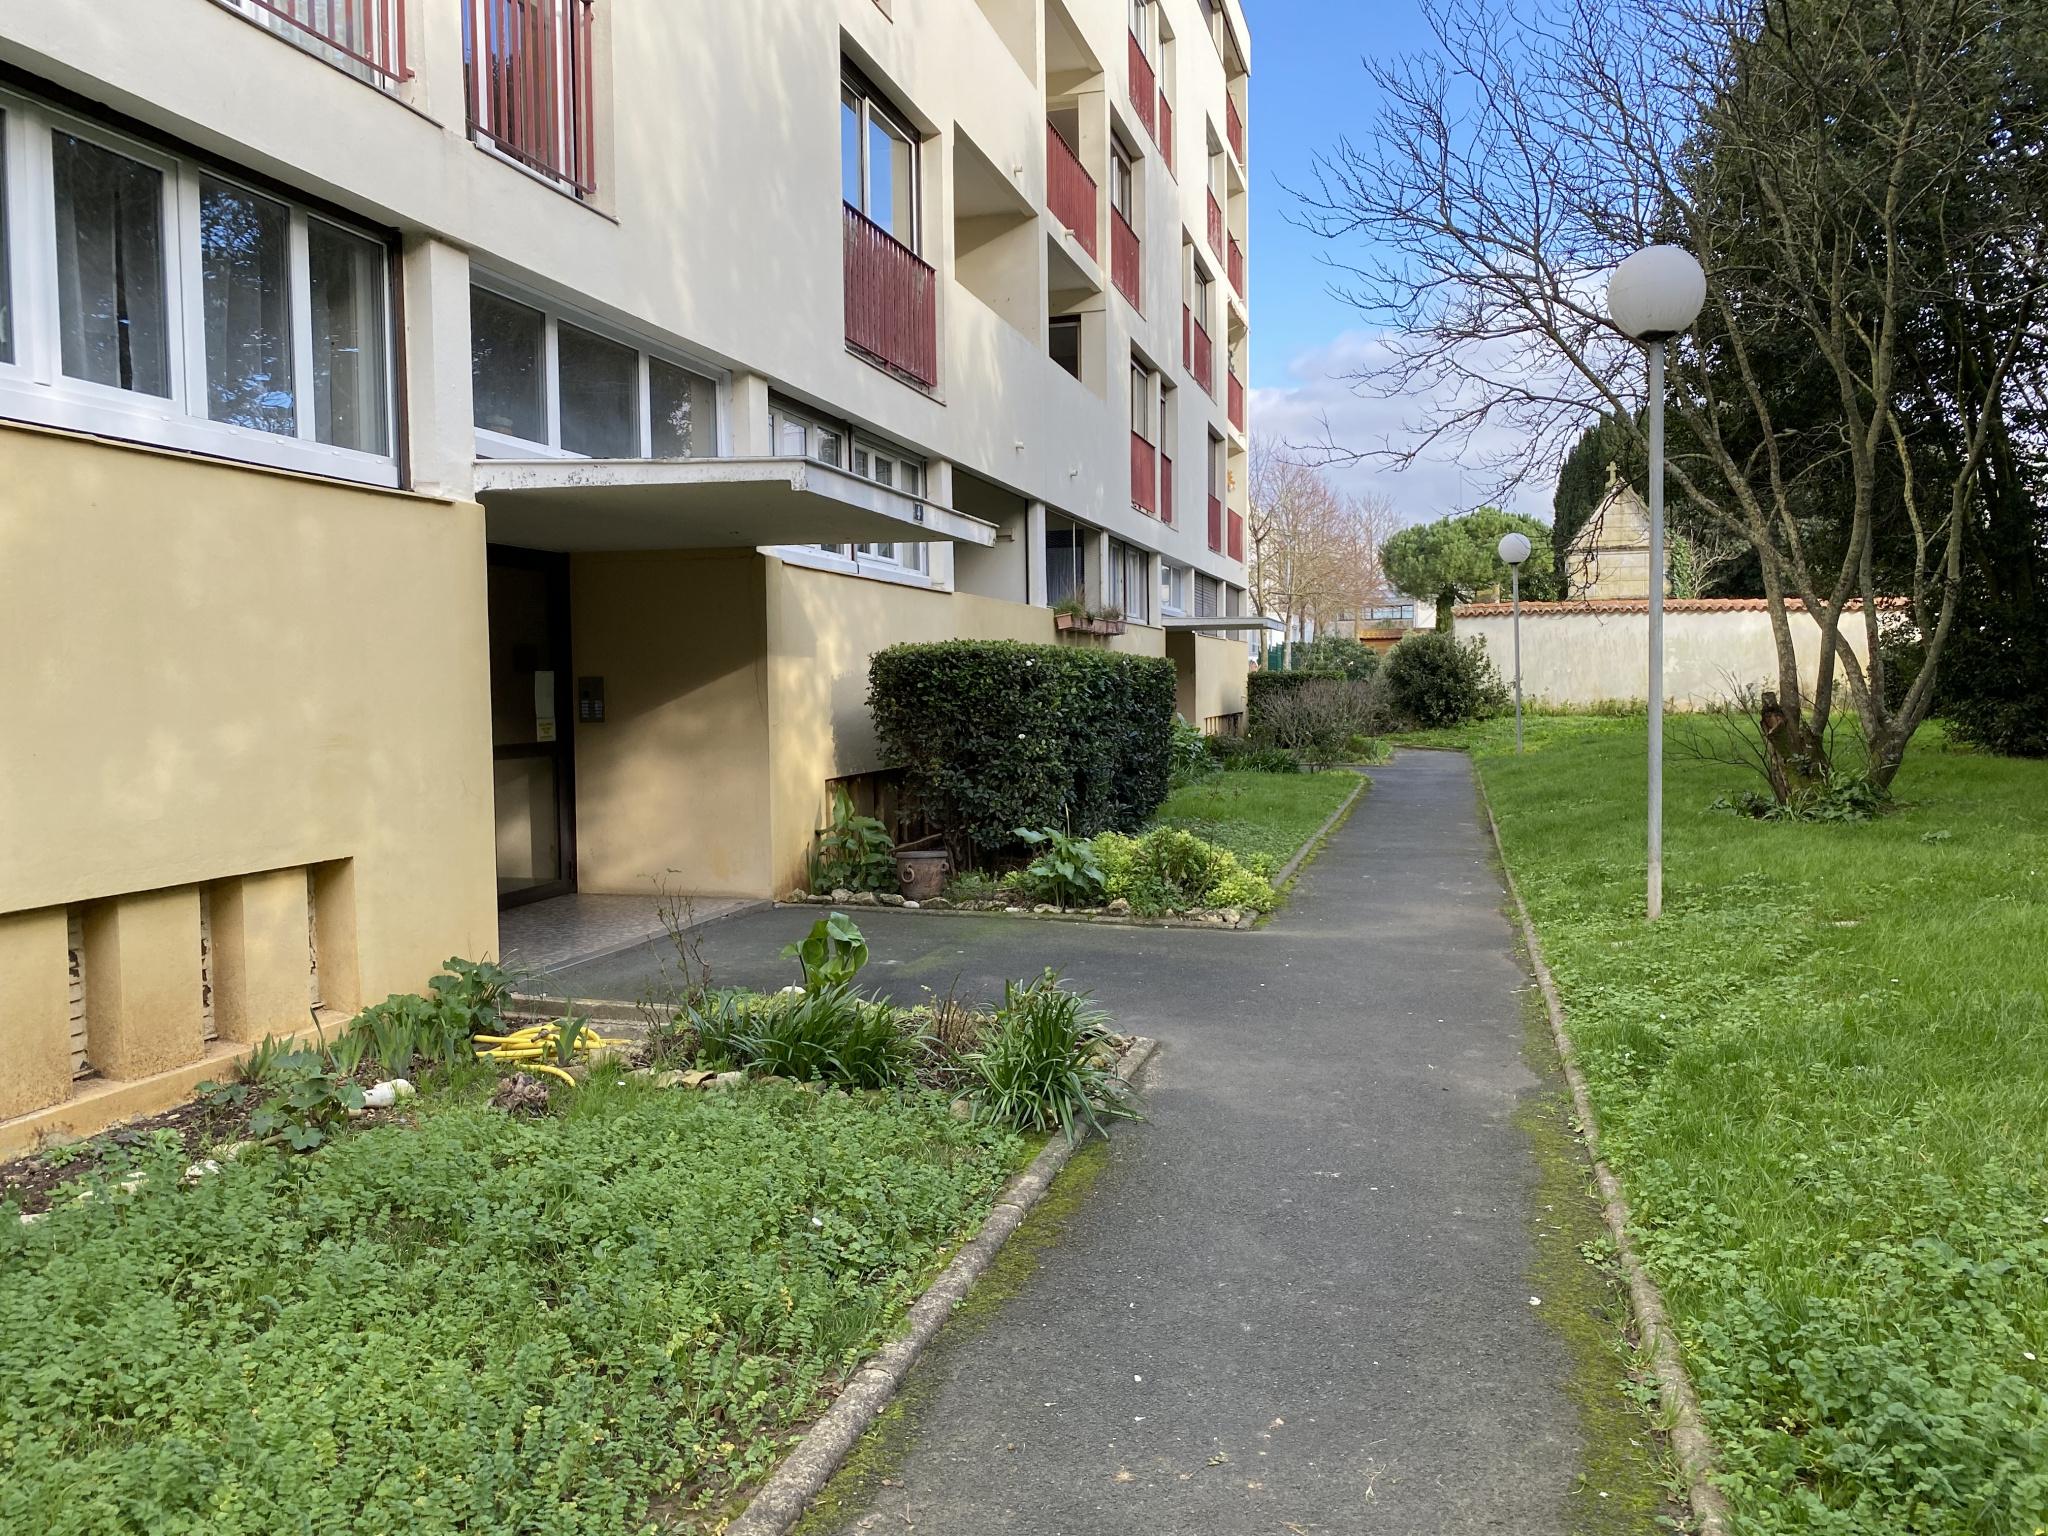 appartement la rochelle LA ROCHELLE - TYPE IV - LA ROSSIGNOLETTE